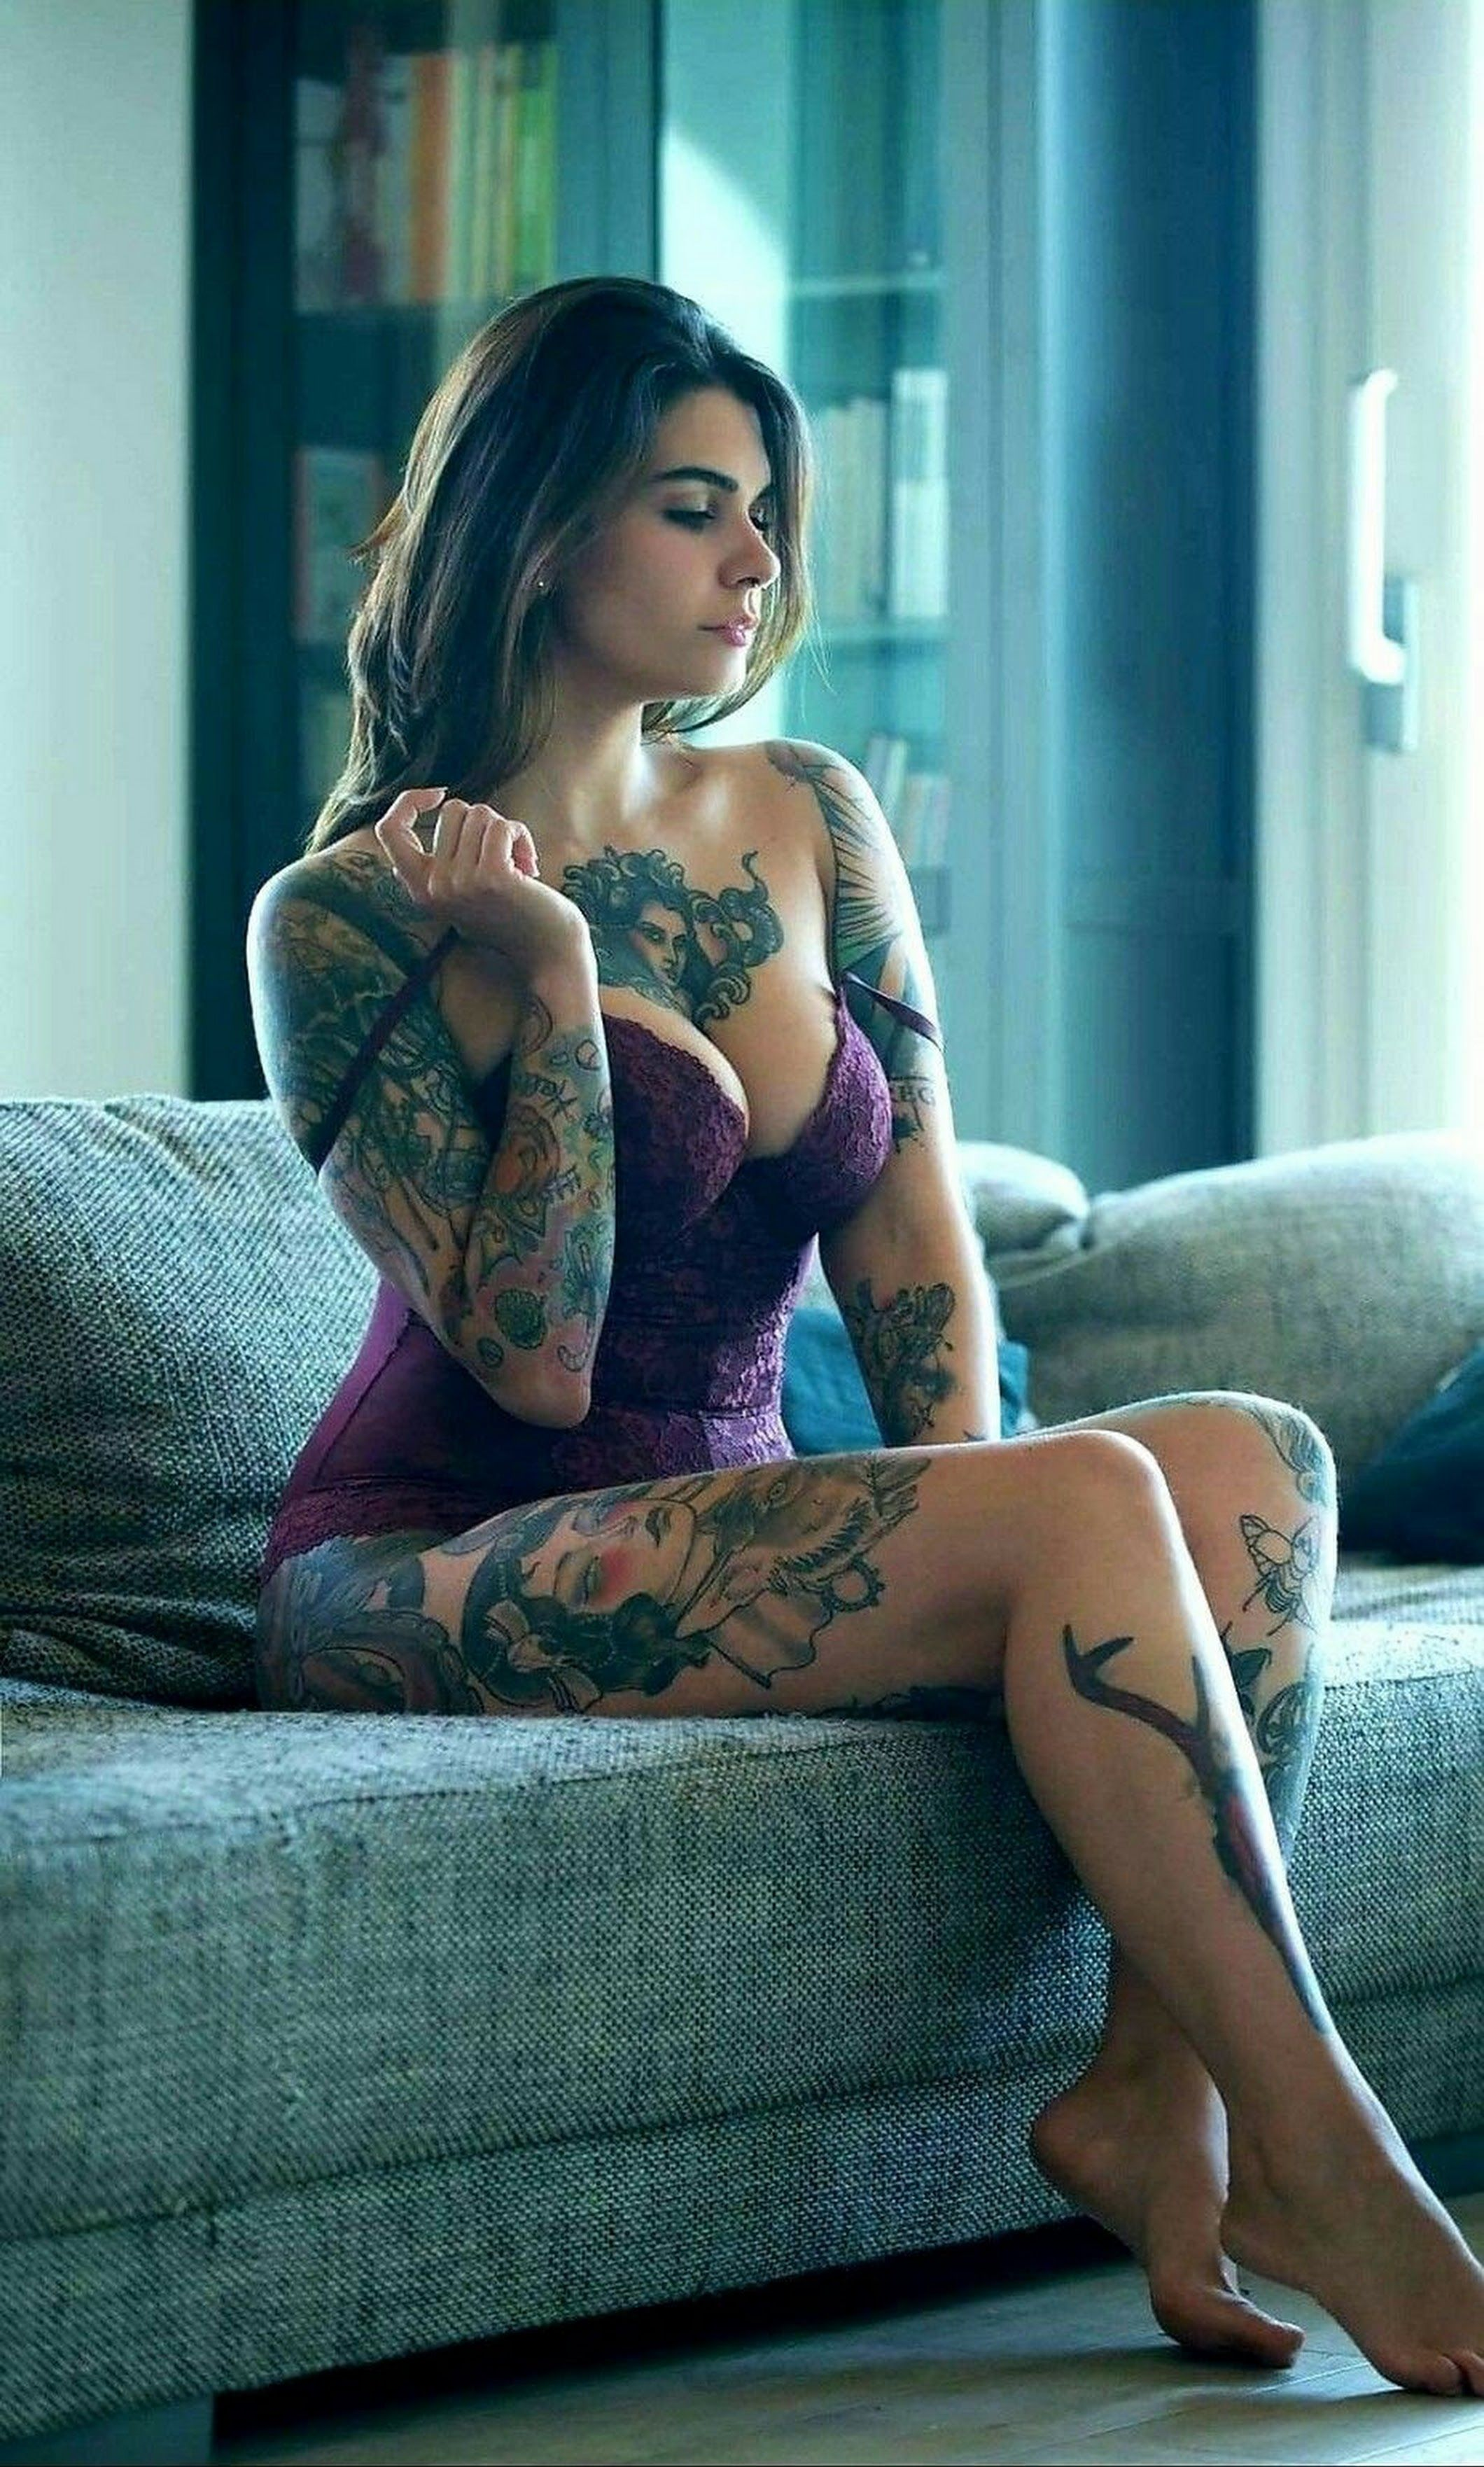 Tattoo hot girls sexy nude mit